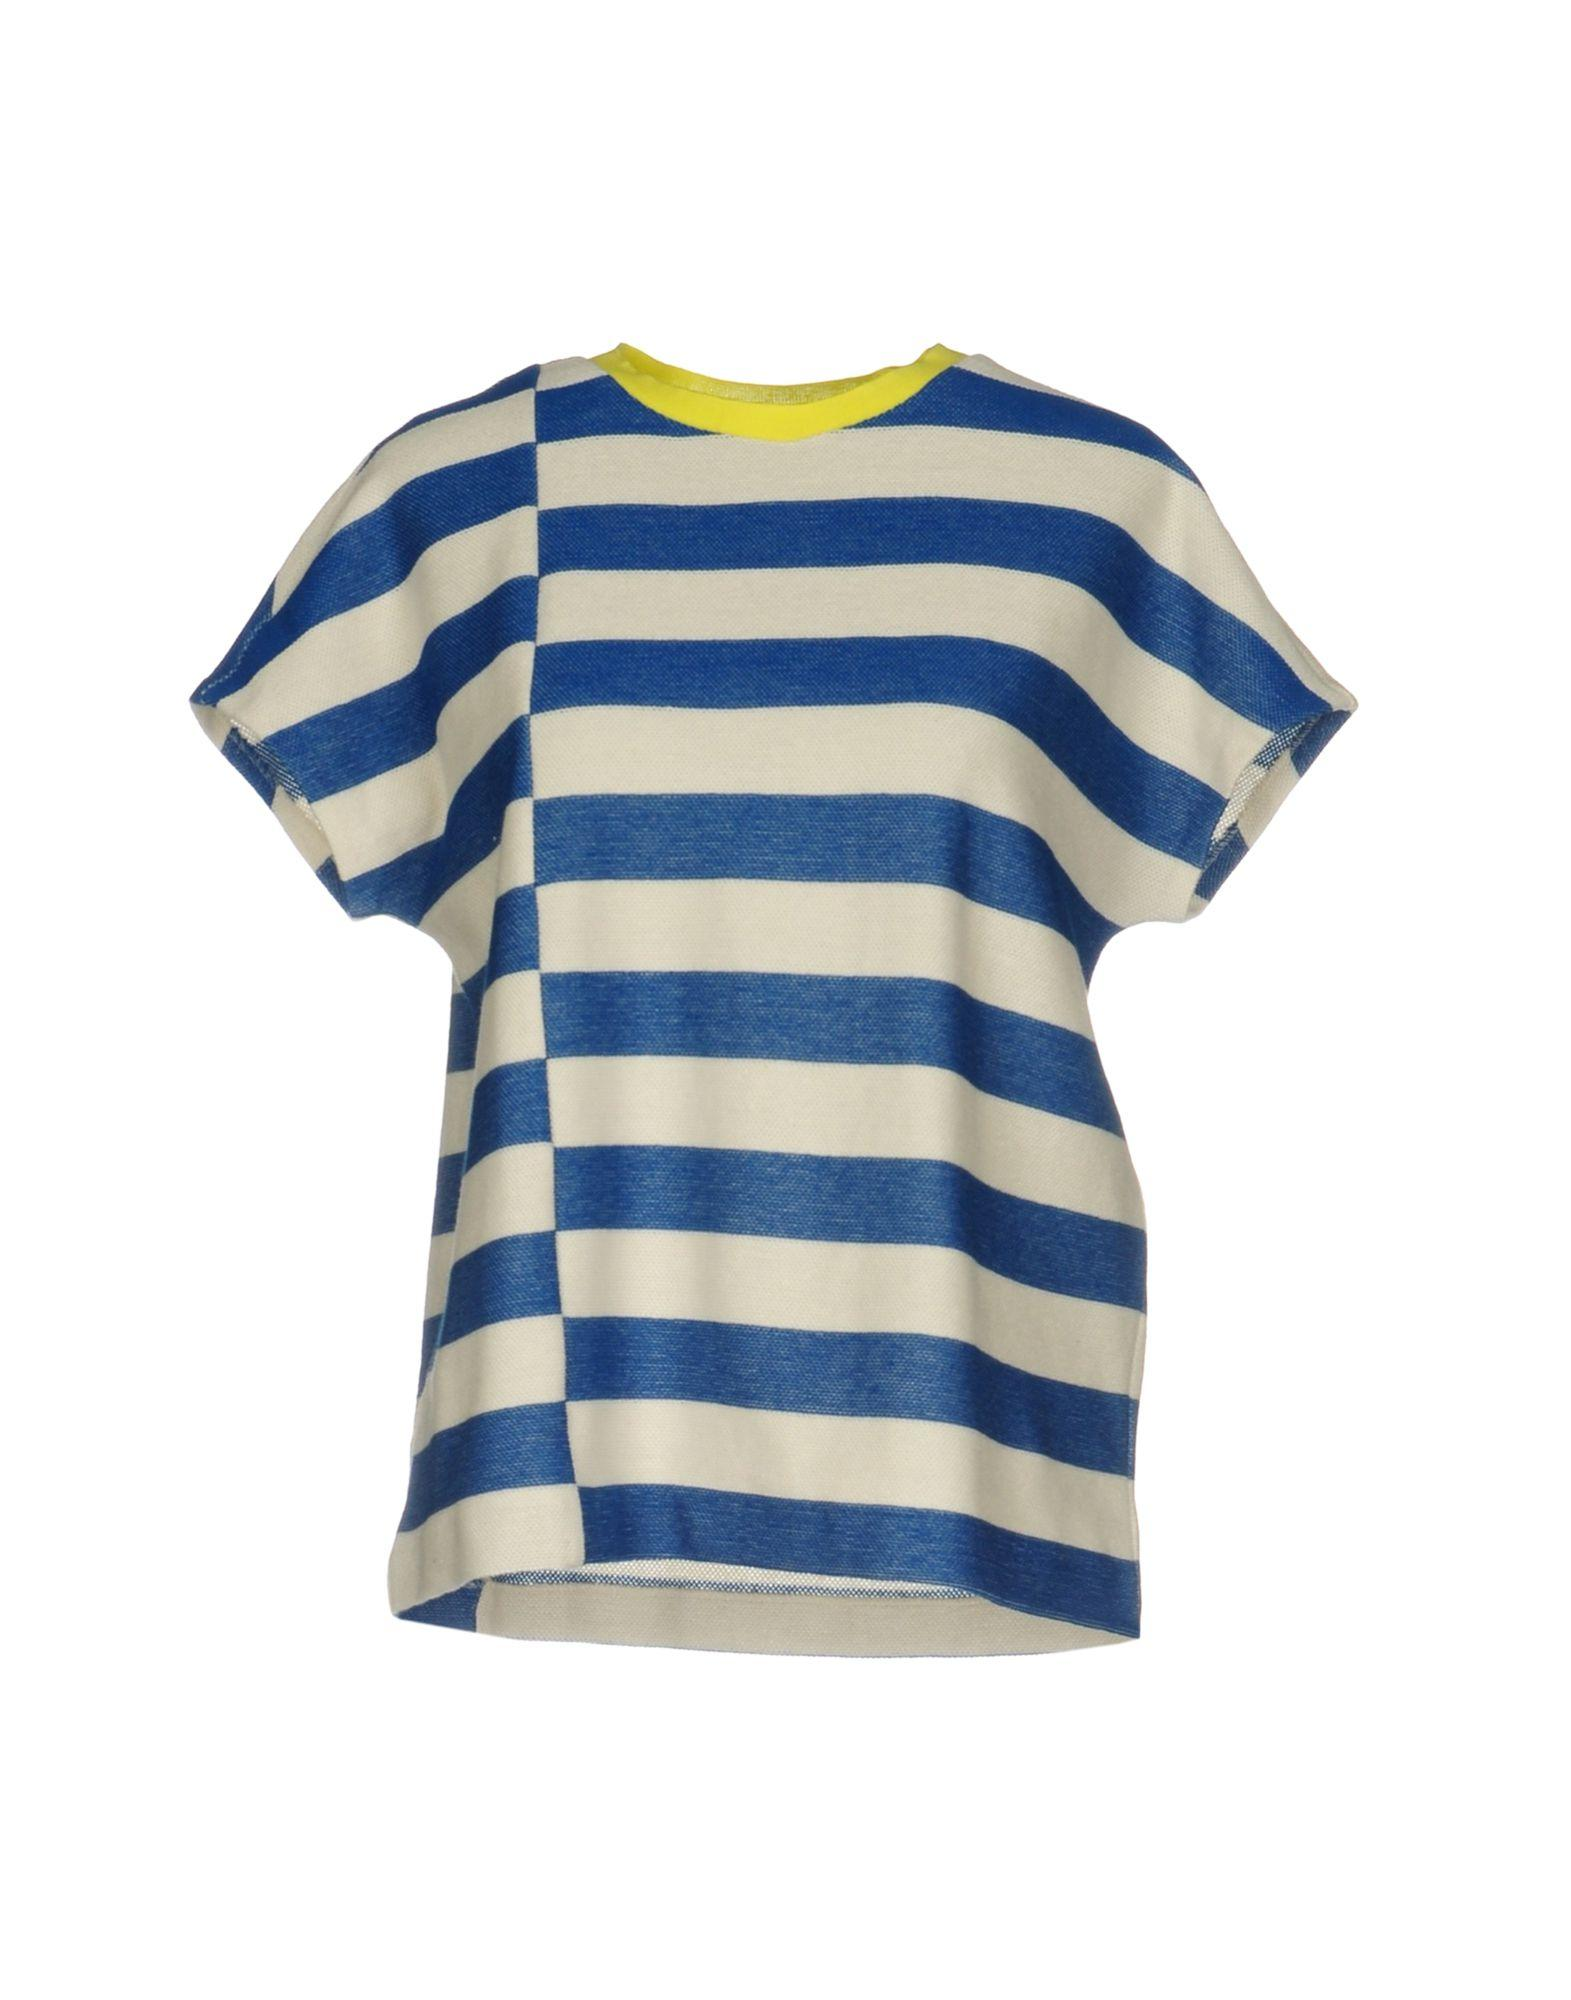 Tory Burch T Shirt In Blue Lyst